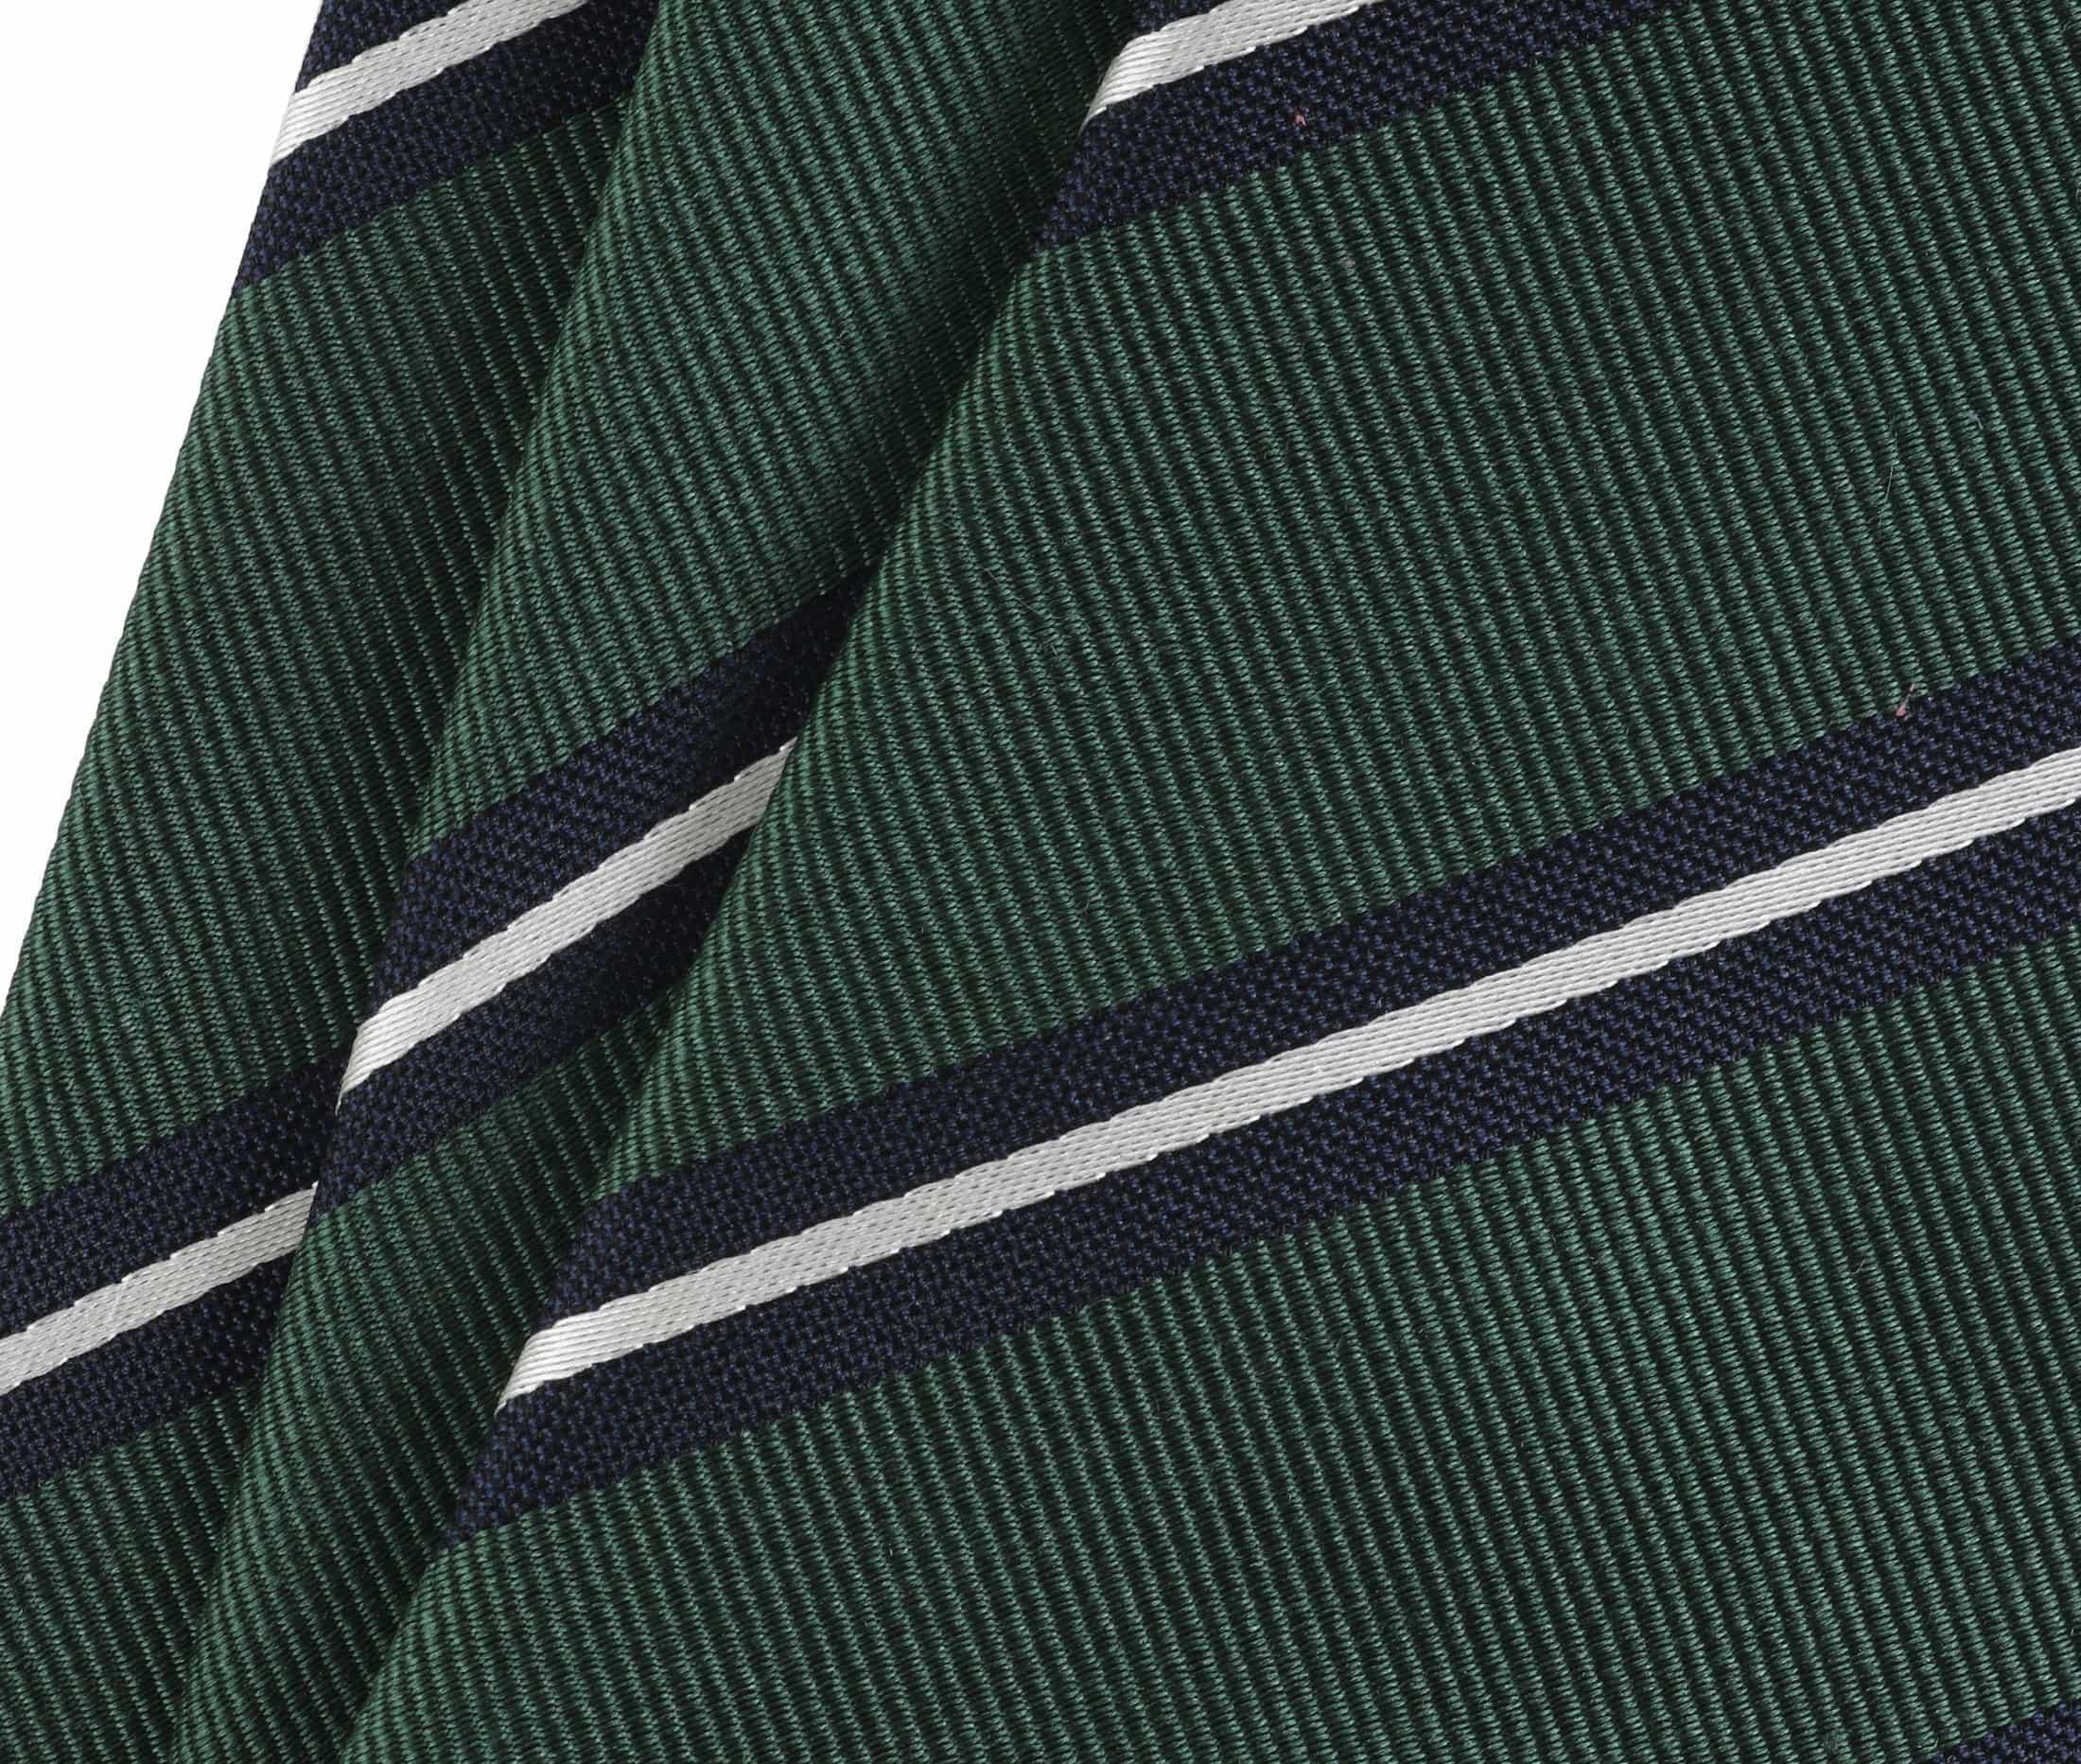 Krawatte Seide Grün Streifen foto 1